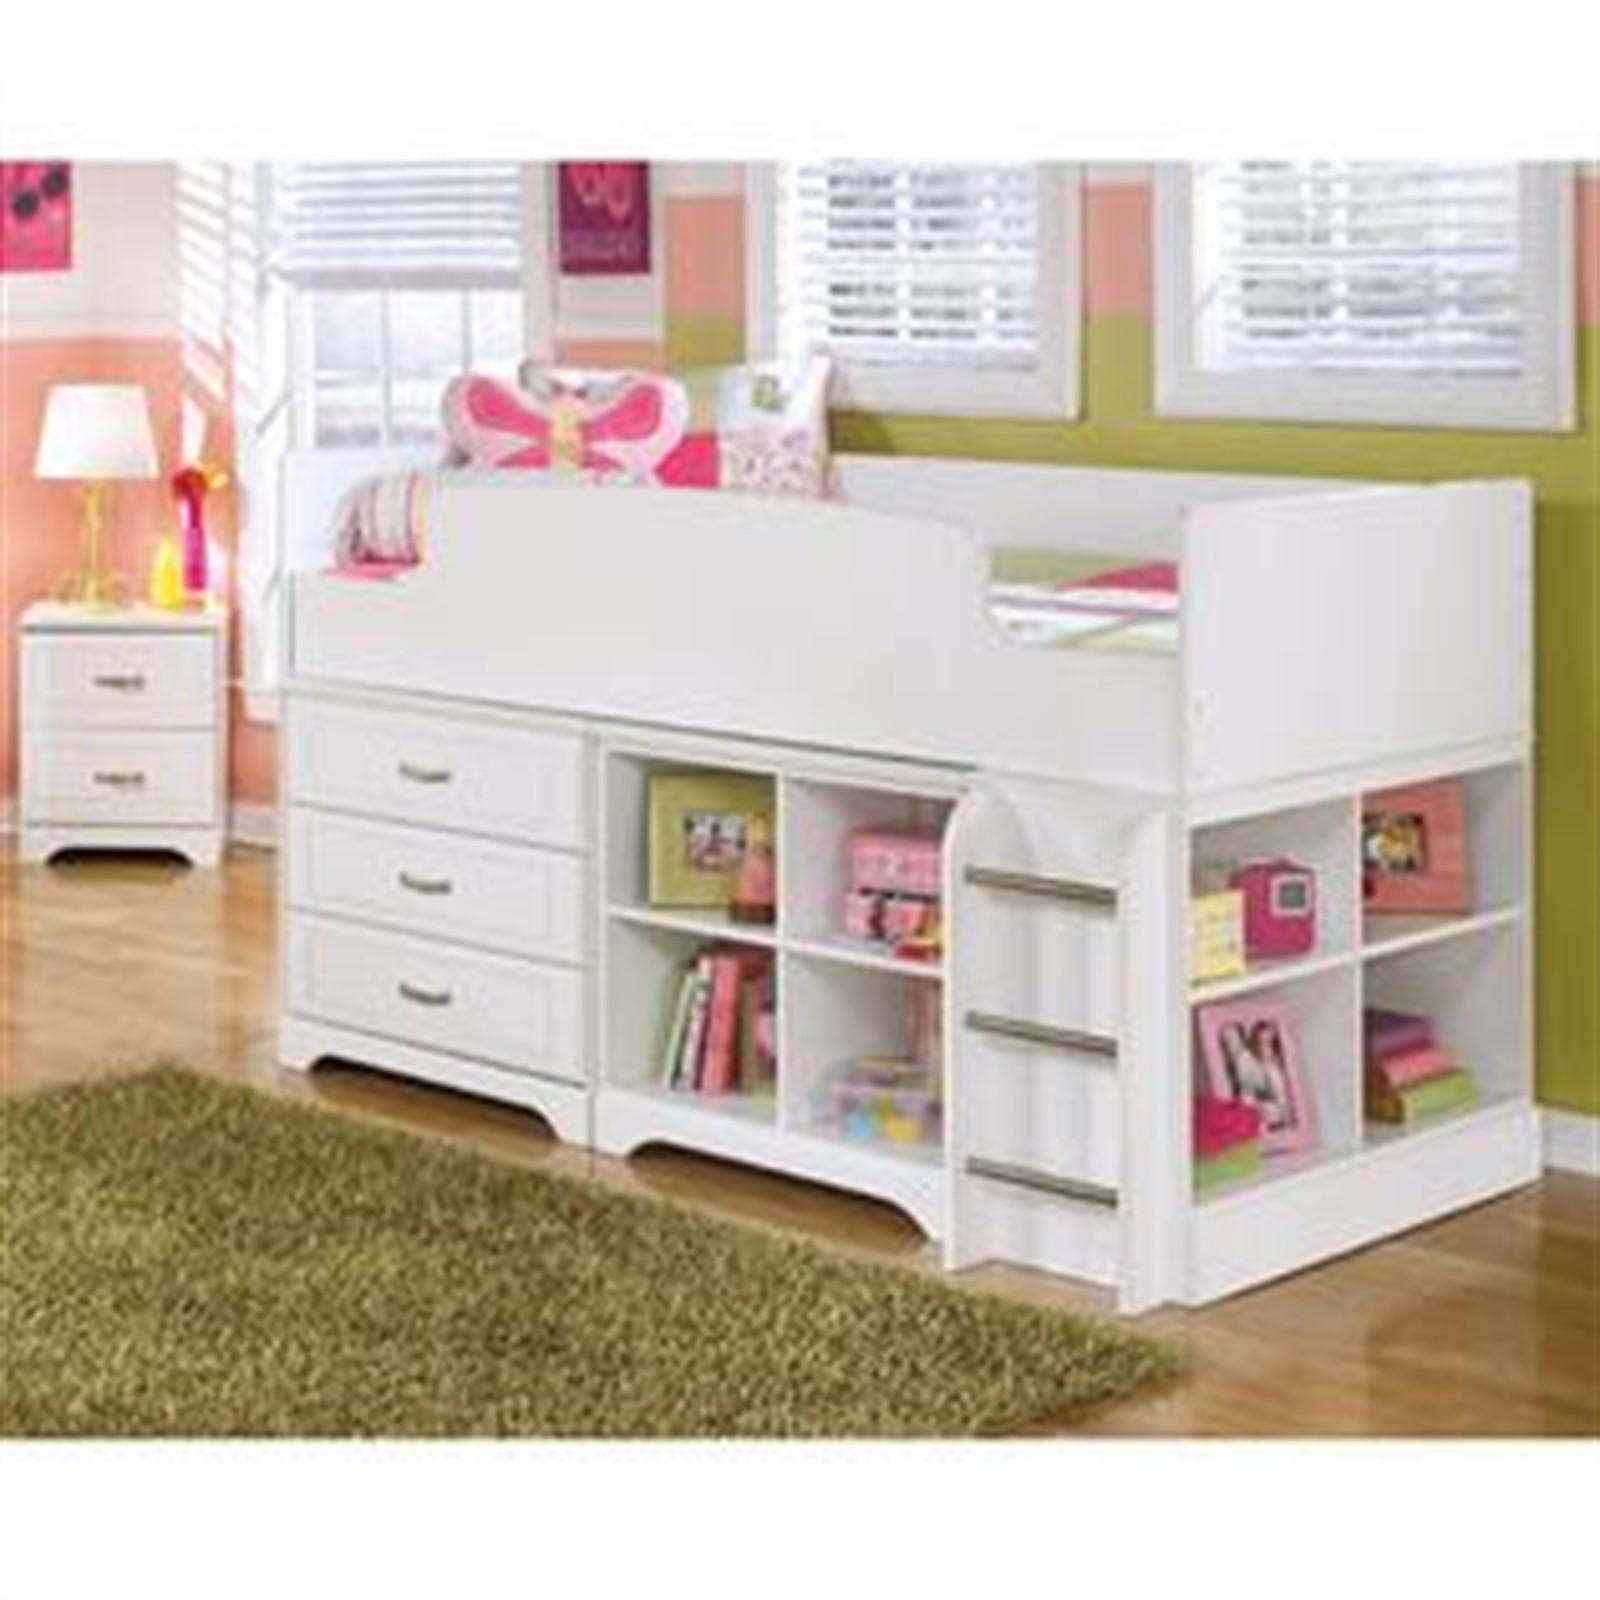 Lulu Loft Bed with Storage - Twin - White